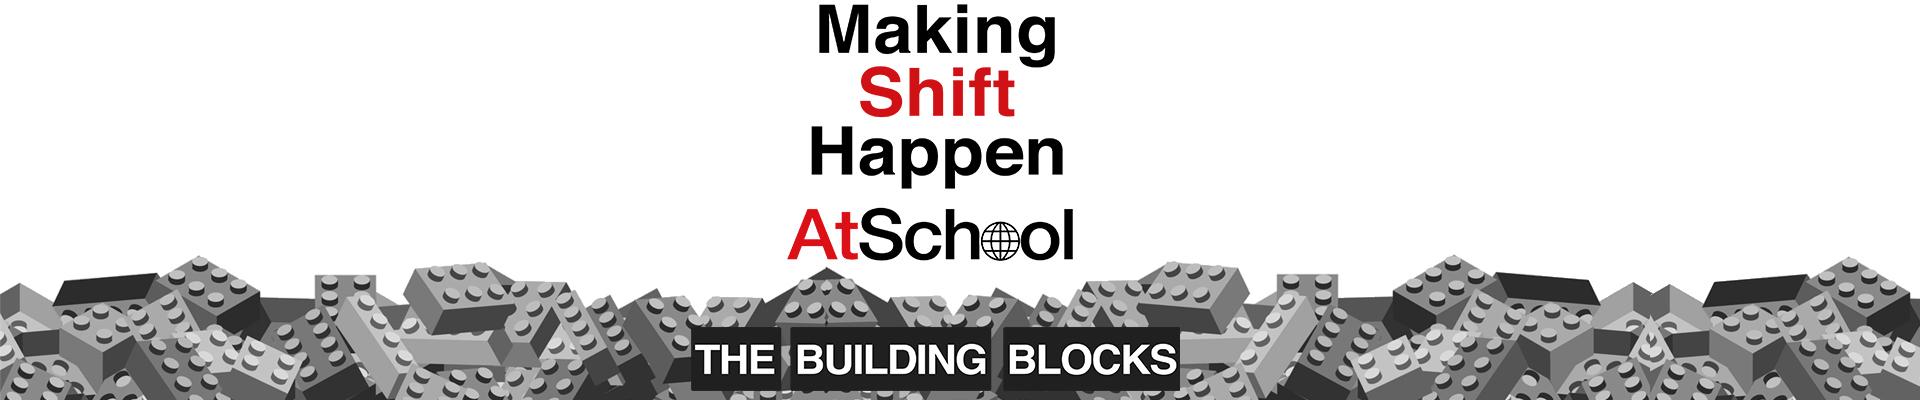 Making Shift Happen 2018 - AtSchool | The Building Blocks